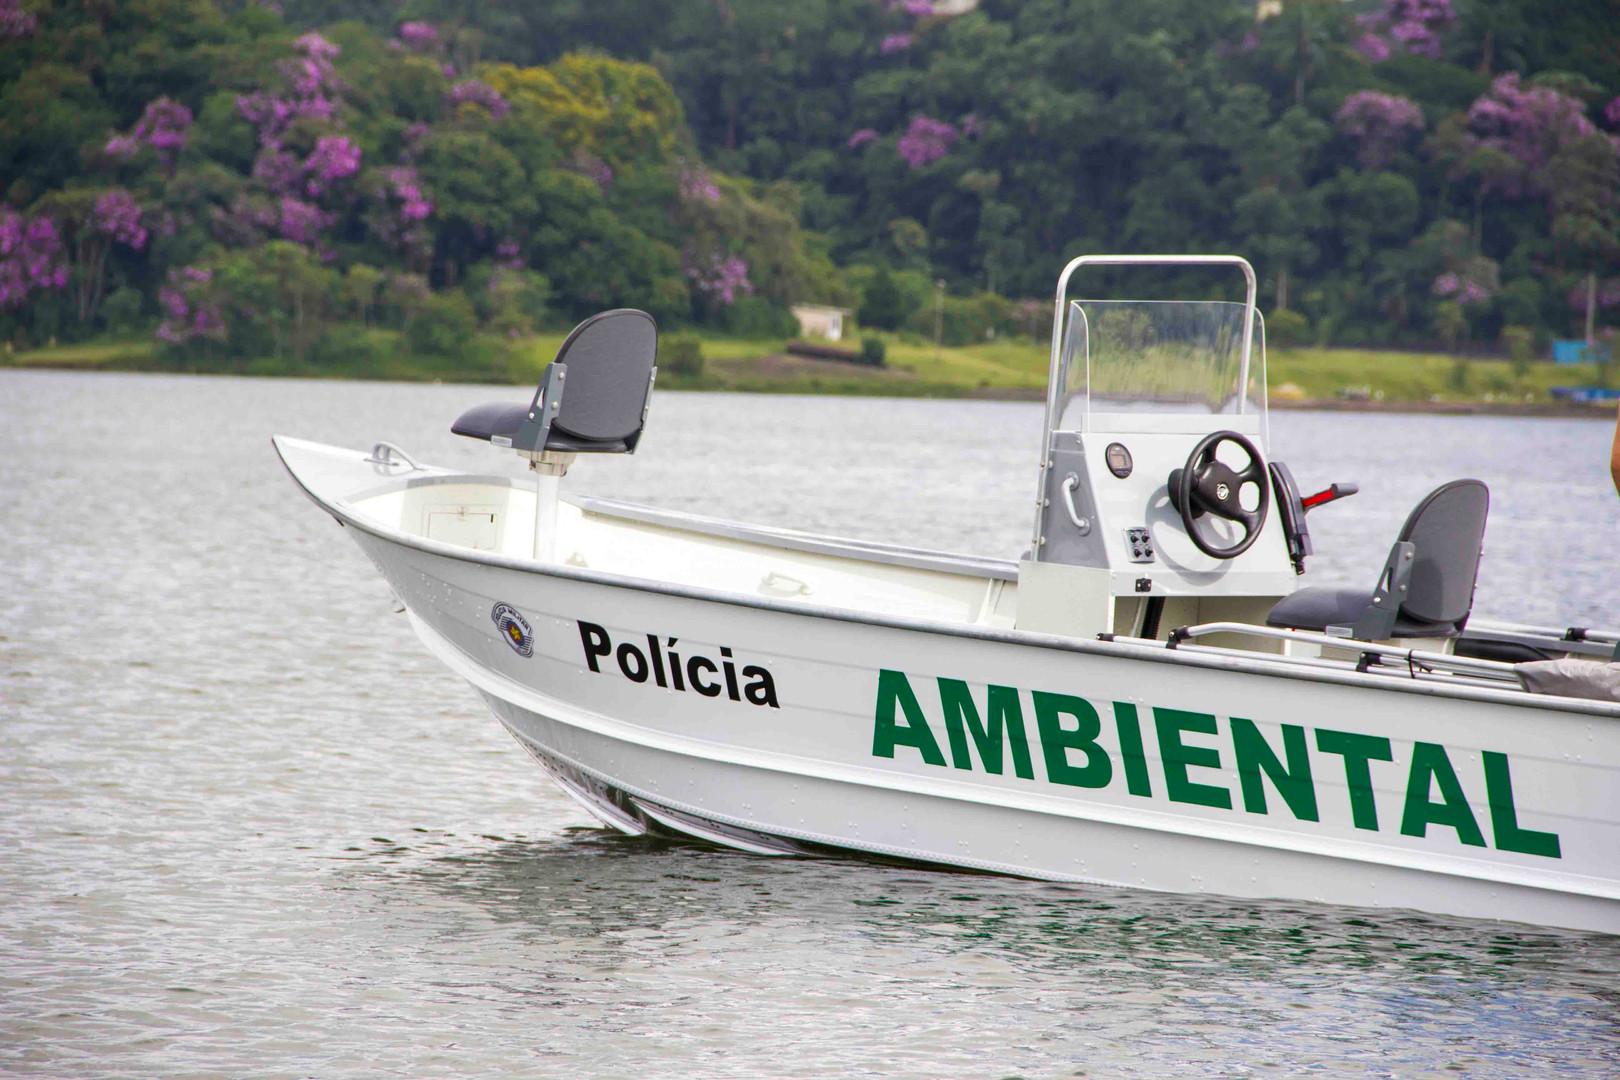 Policia Ambiental SP